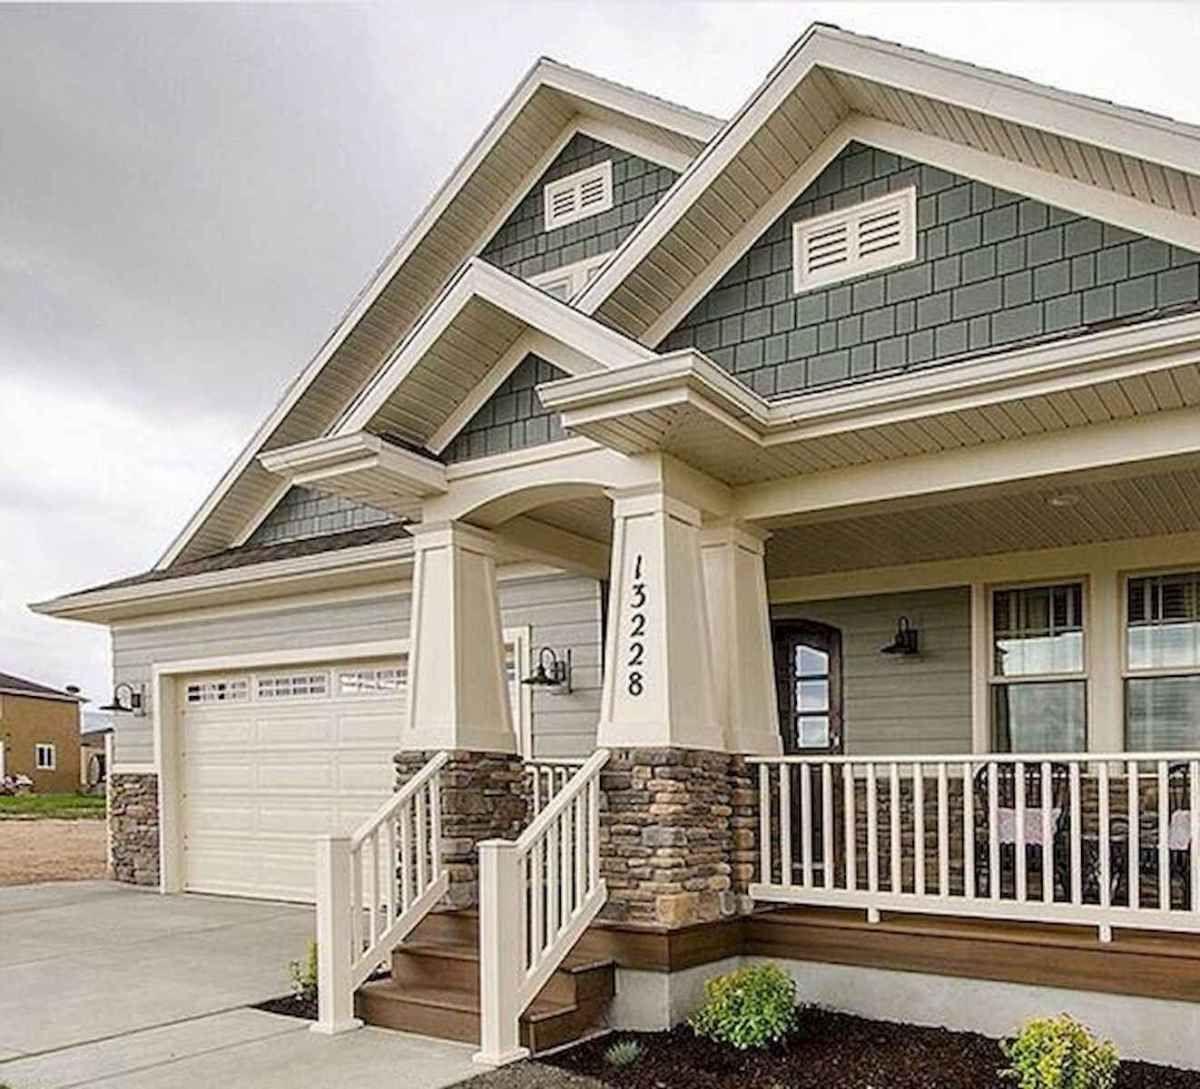 40 Amazing Craftsman Style Homes Design Ideas 18 House Paint Exterior House Exterior Exterior House Colors